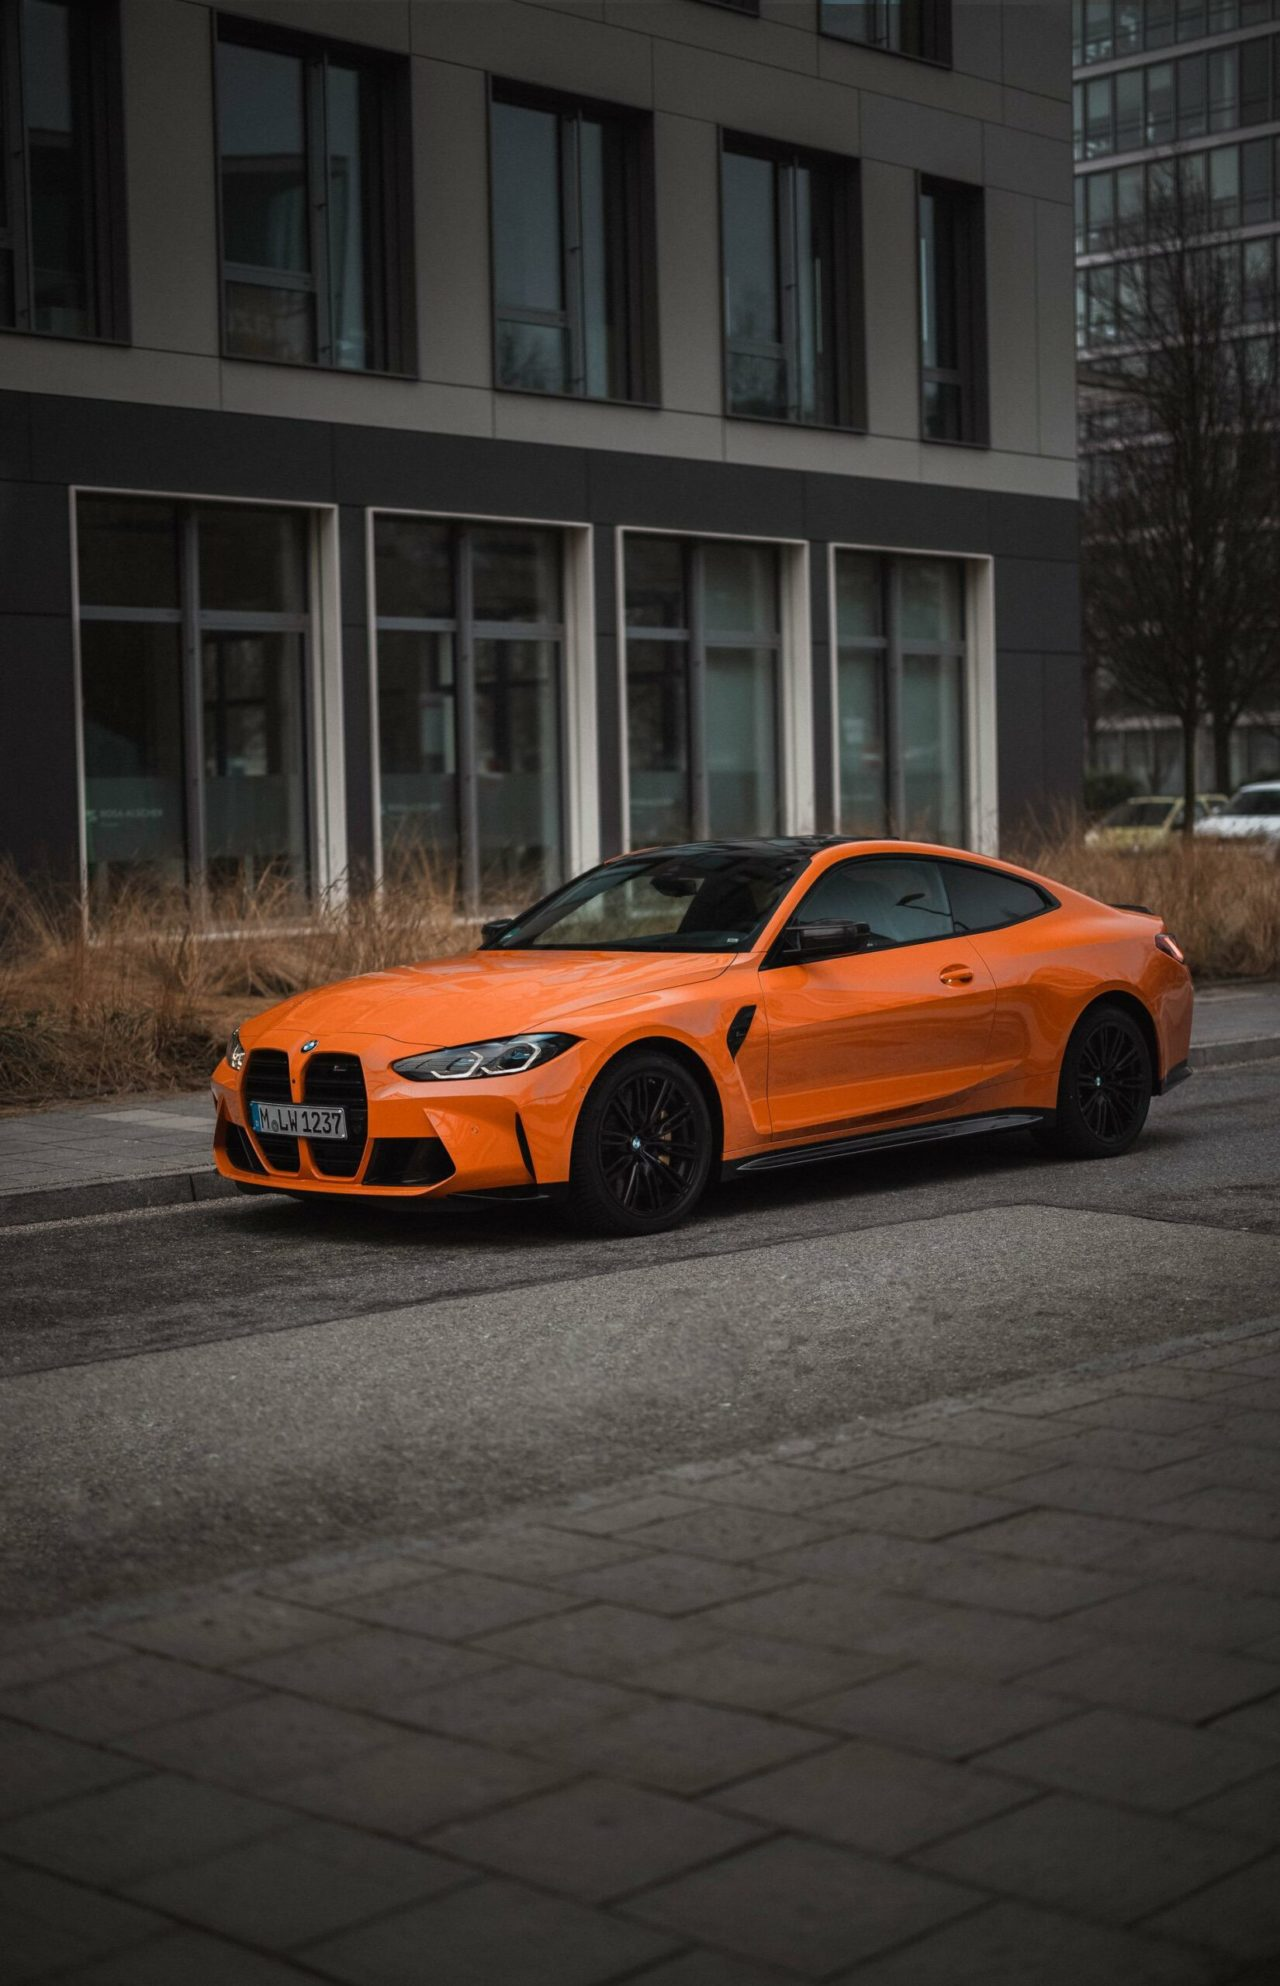 2021_bmw_m4_g82_fire_orange_02-scaled-1280x1986.jpg